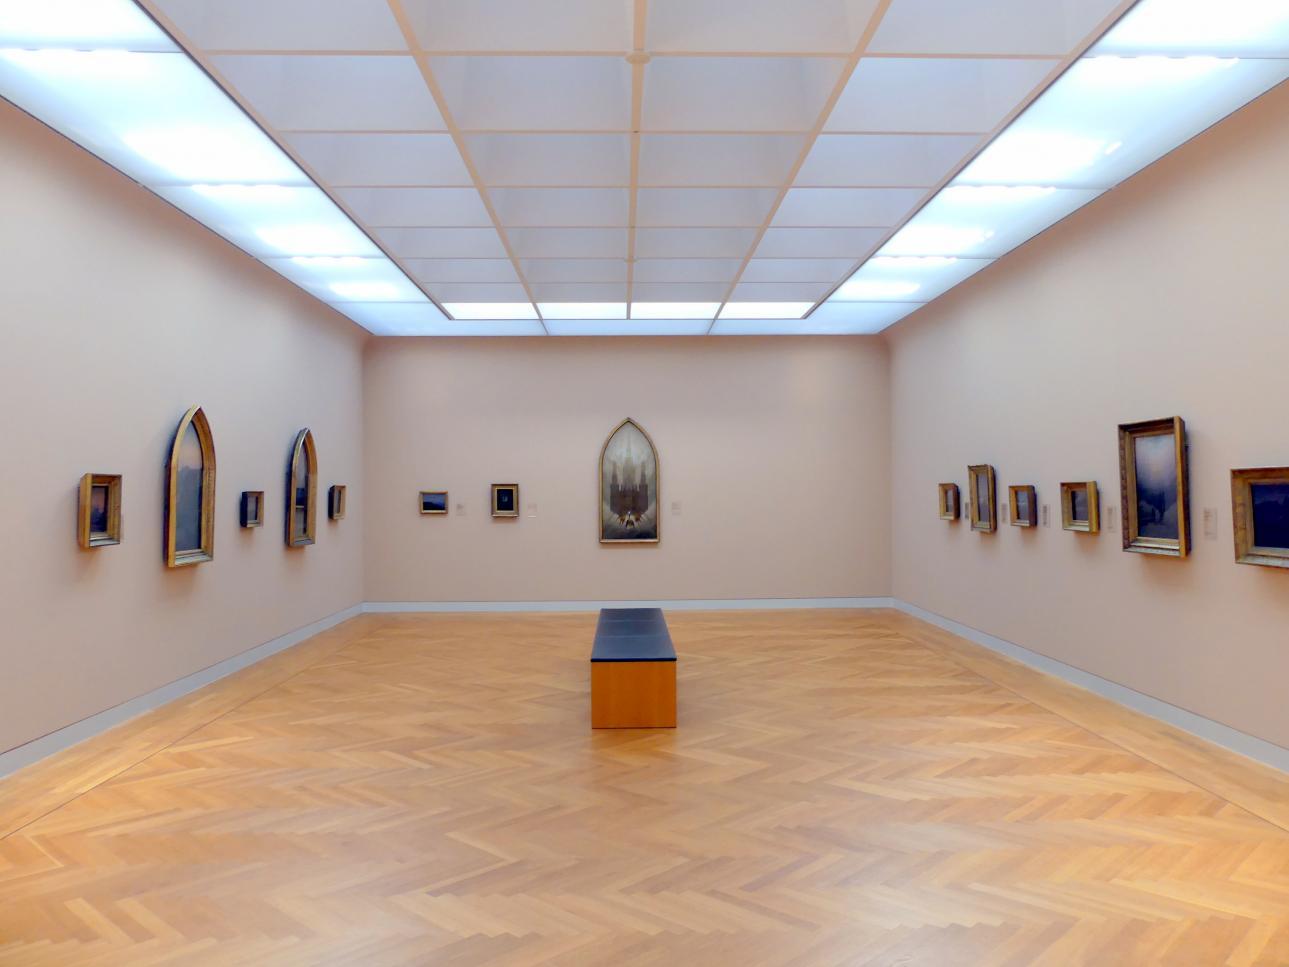 Schweinfurt, Museum Georg Schäfer, Saal 14, Bild 2/3